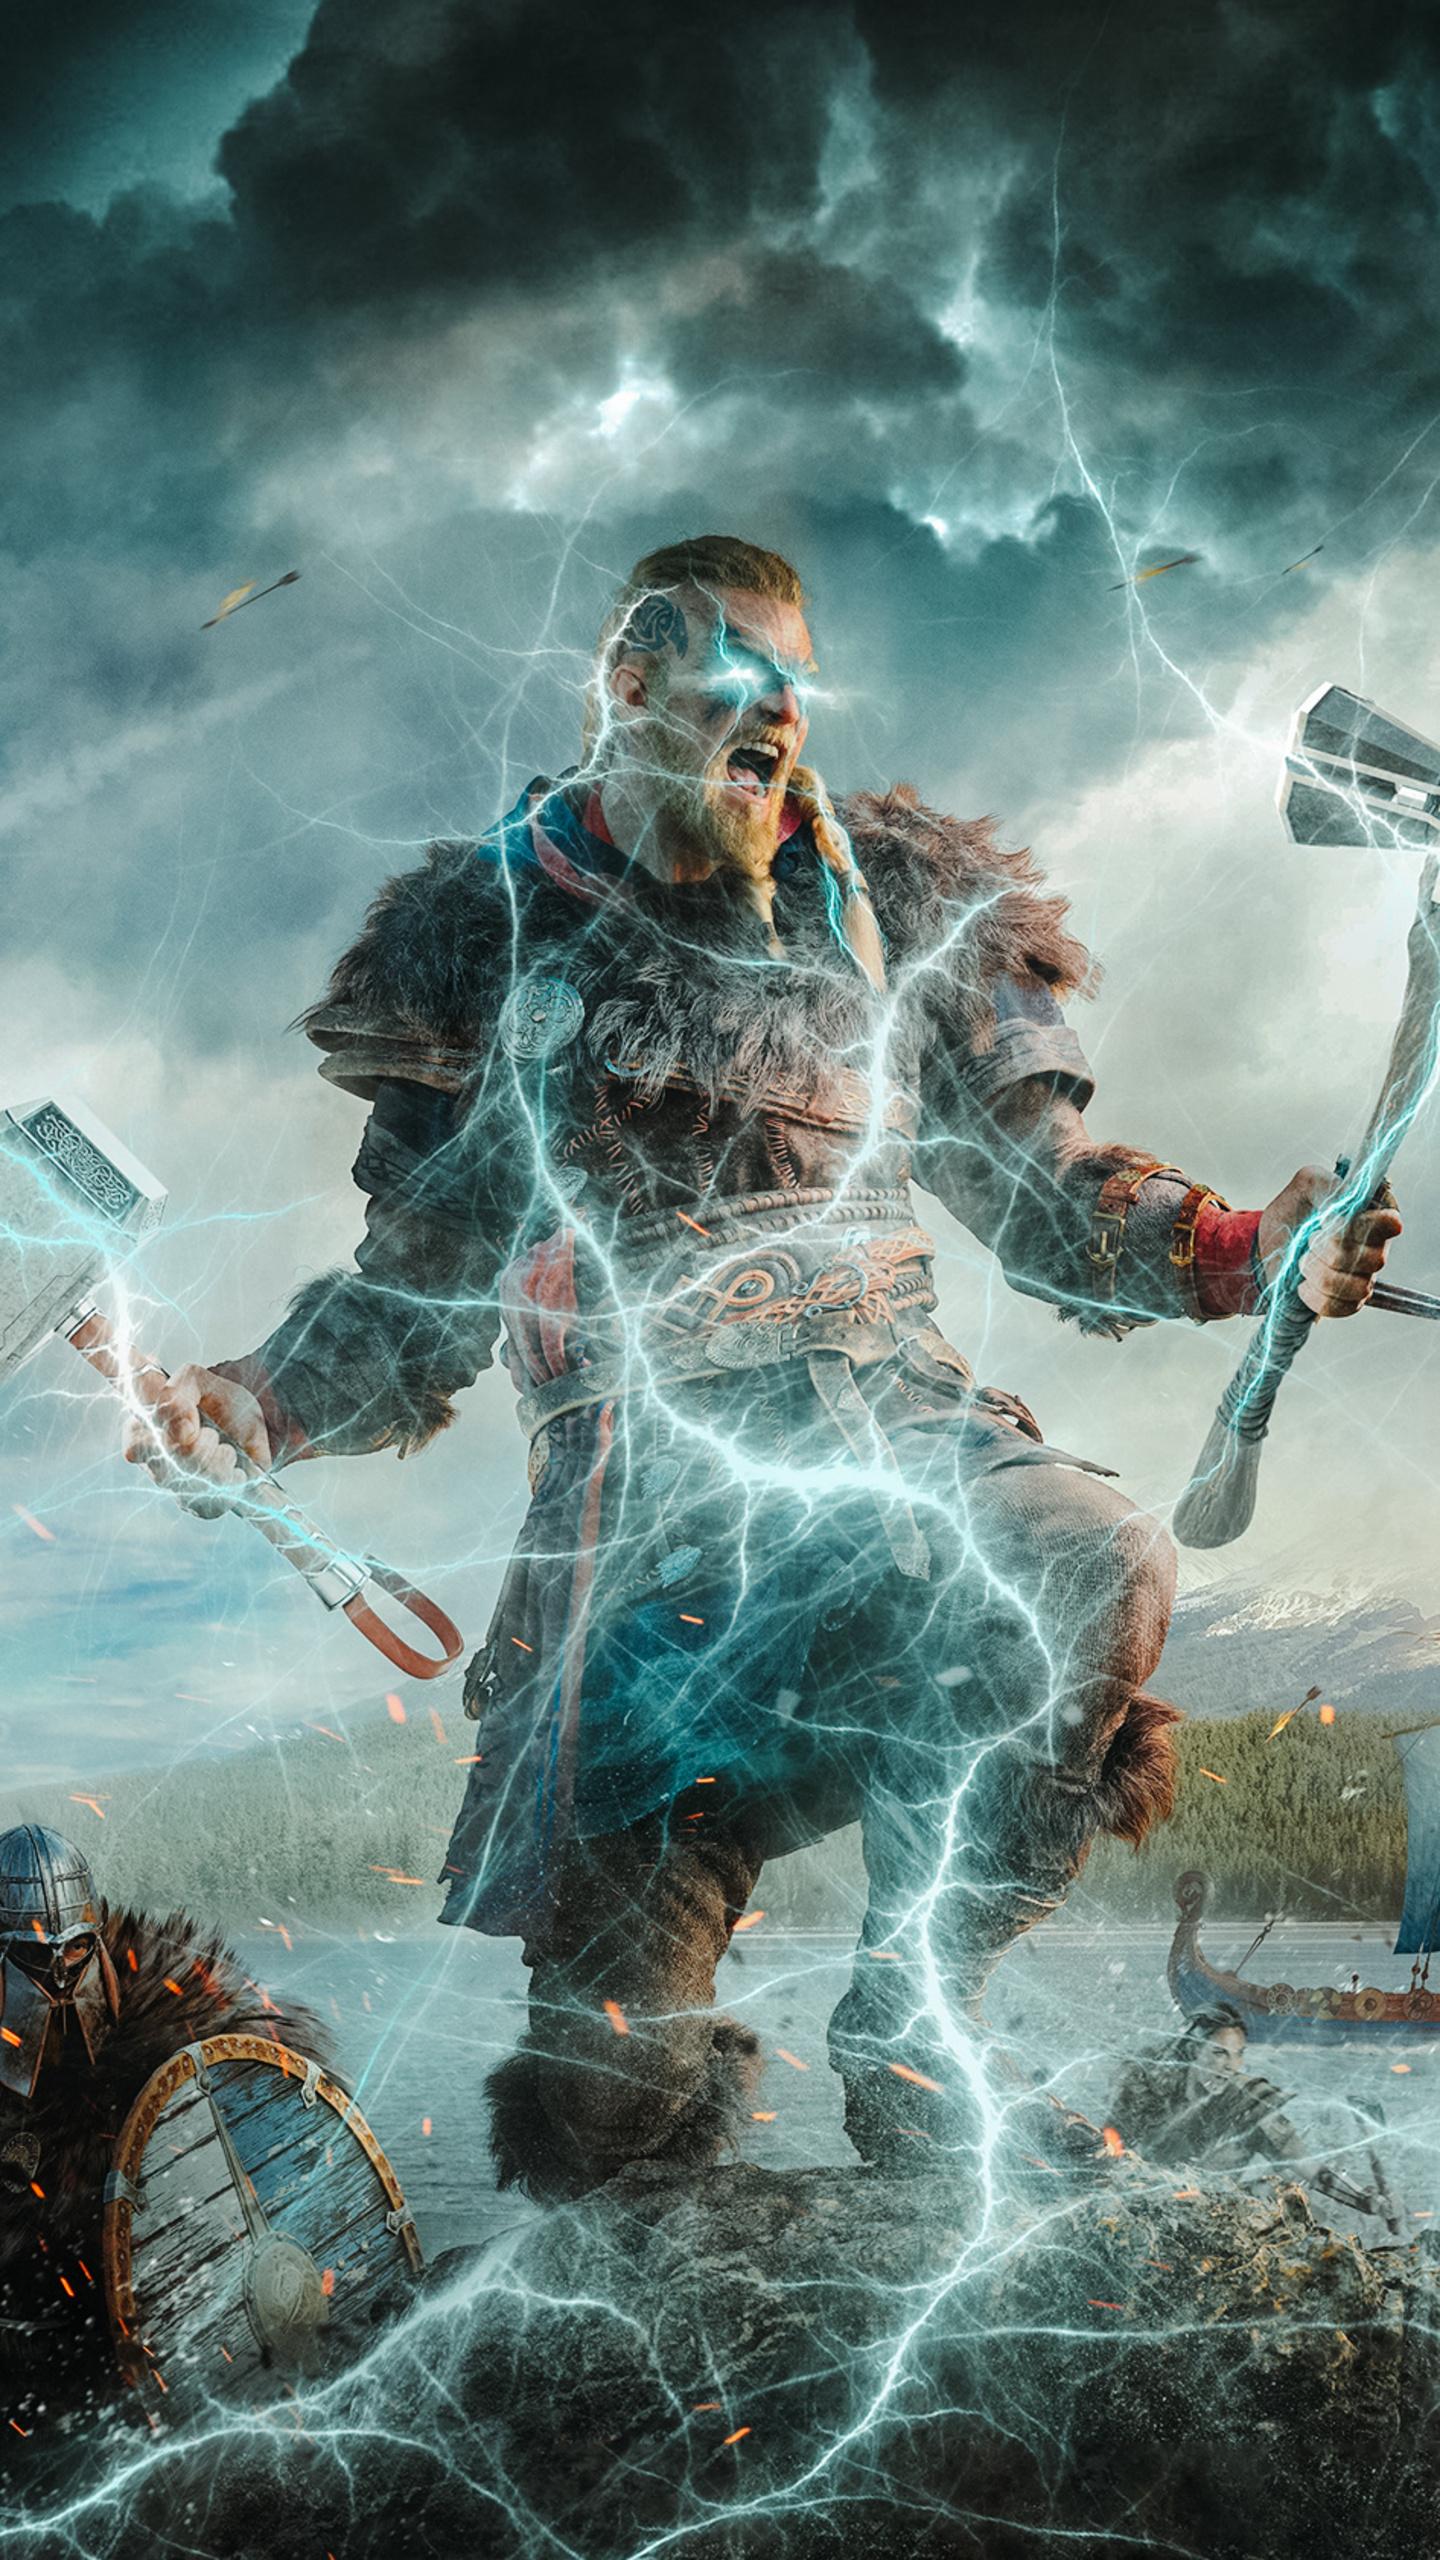 2020-assassins-creed-valhalla-game-tf.jpg